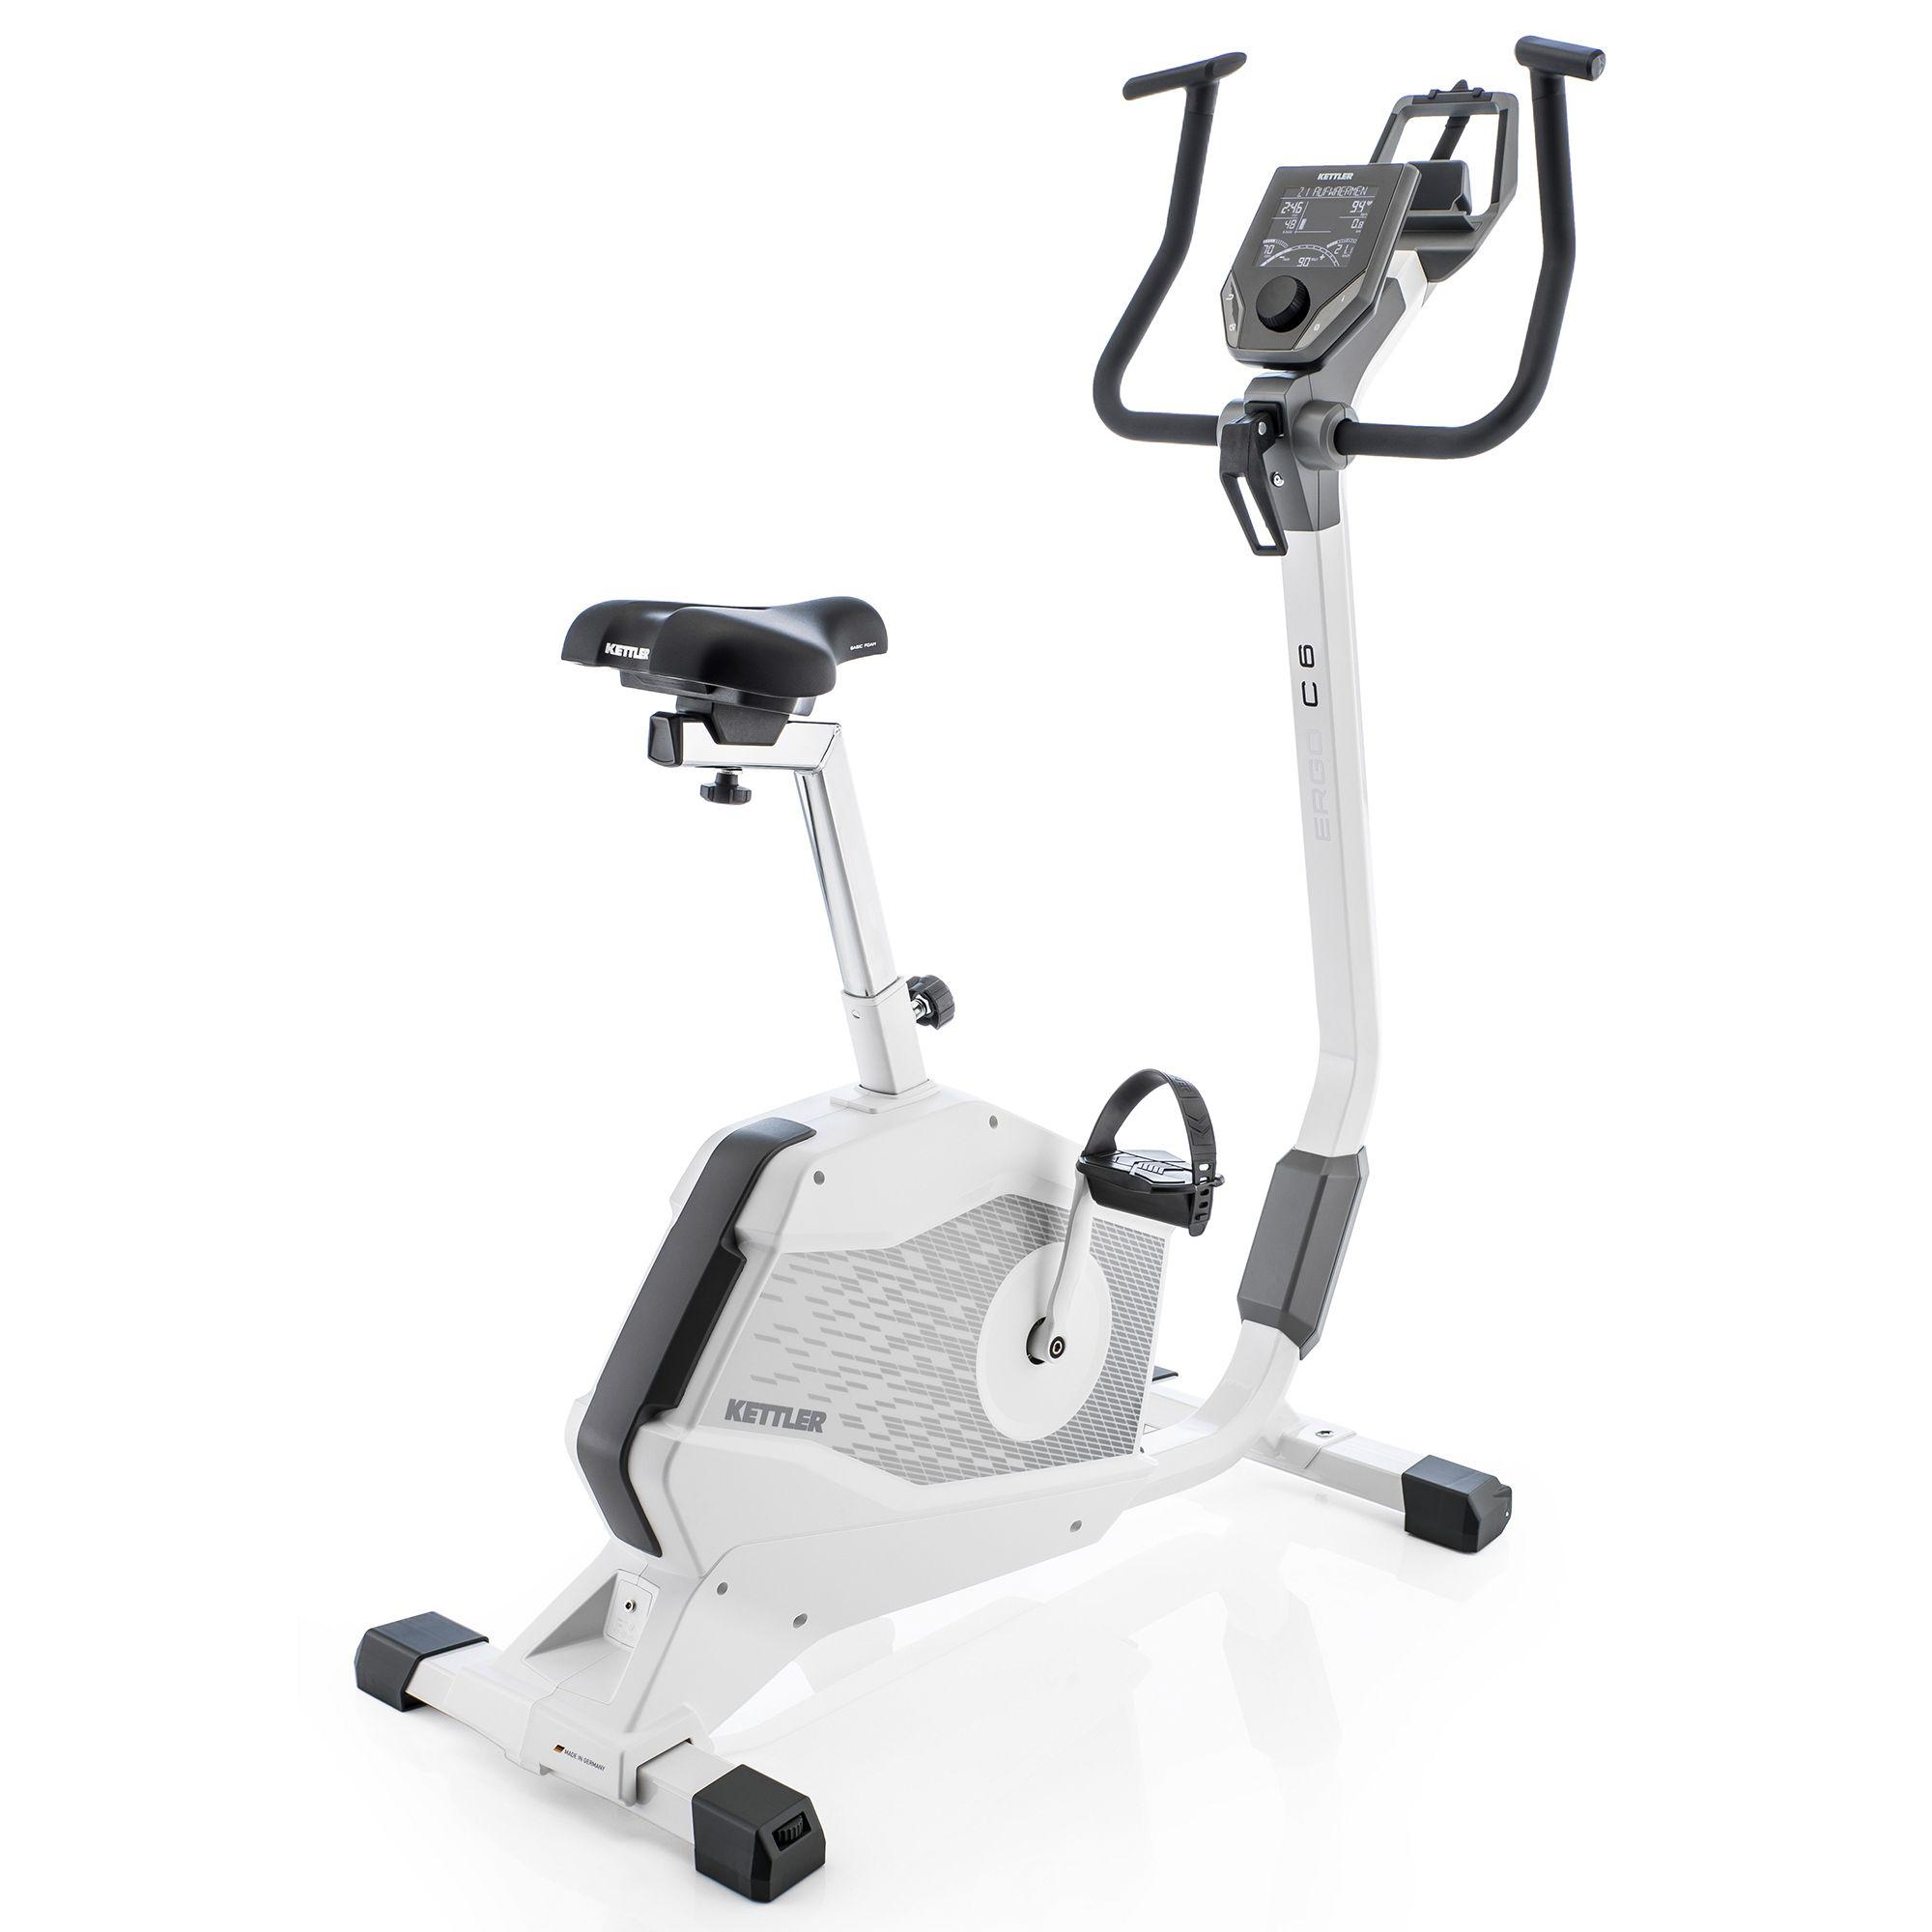 Kettler Ergo C6 Exercise Bike Sweatband Com